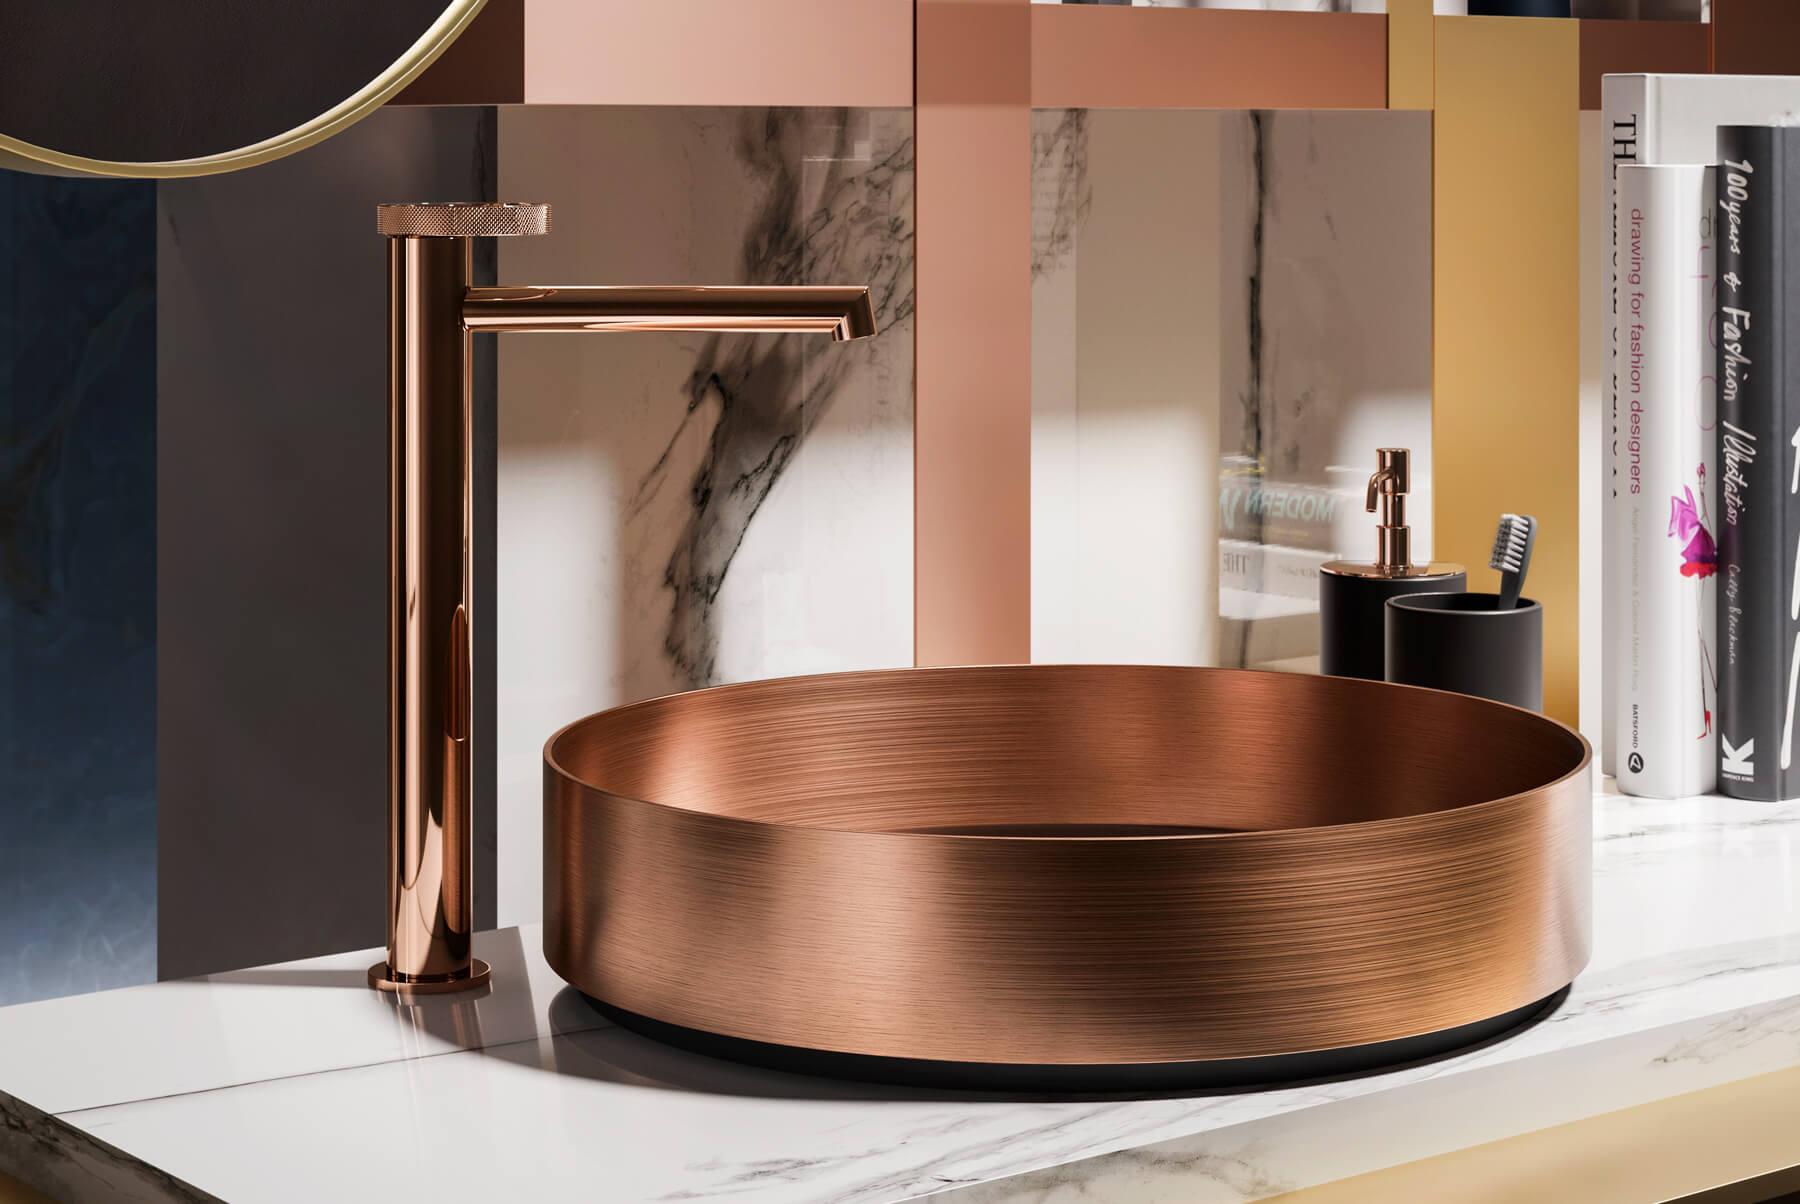 Brassware-GESSI-Anello-Inset-1-1800x1204